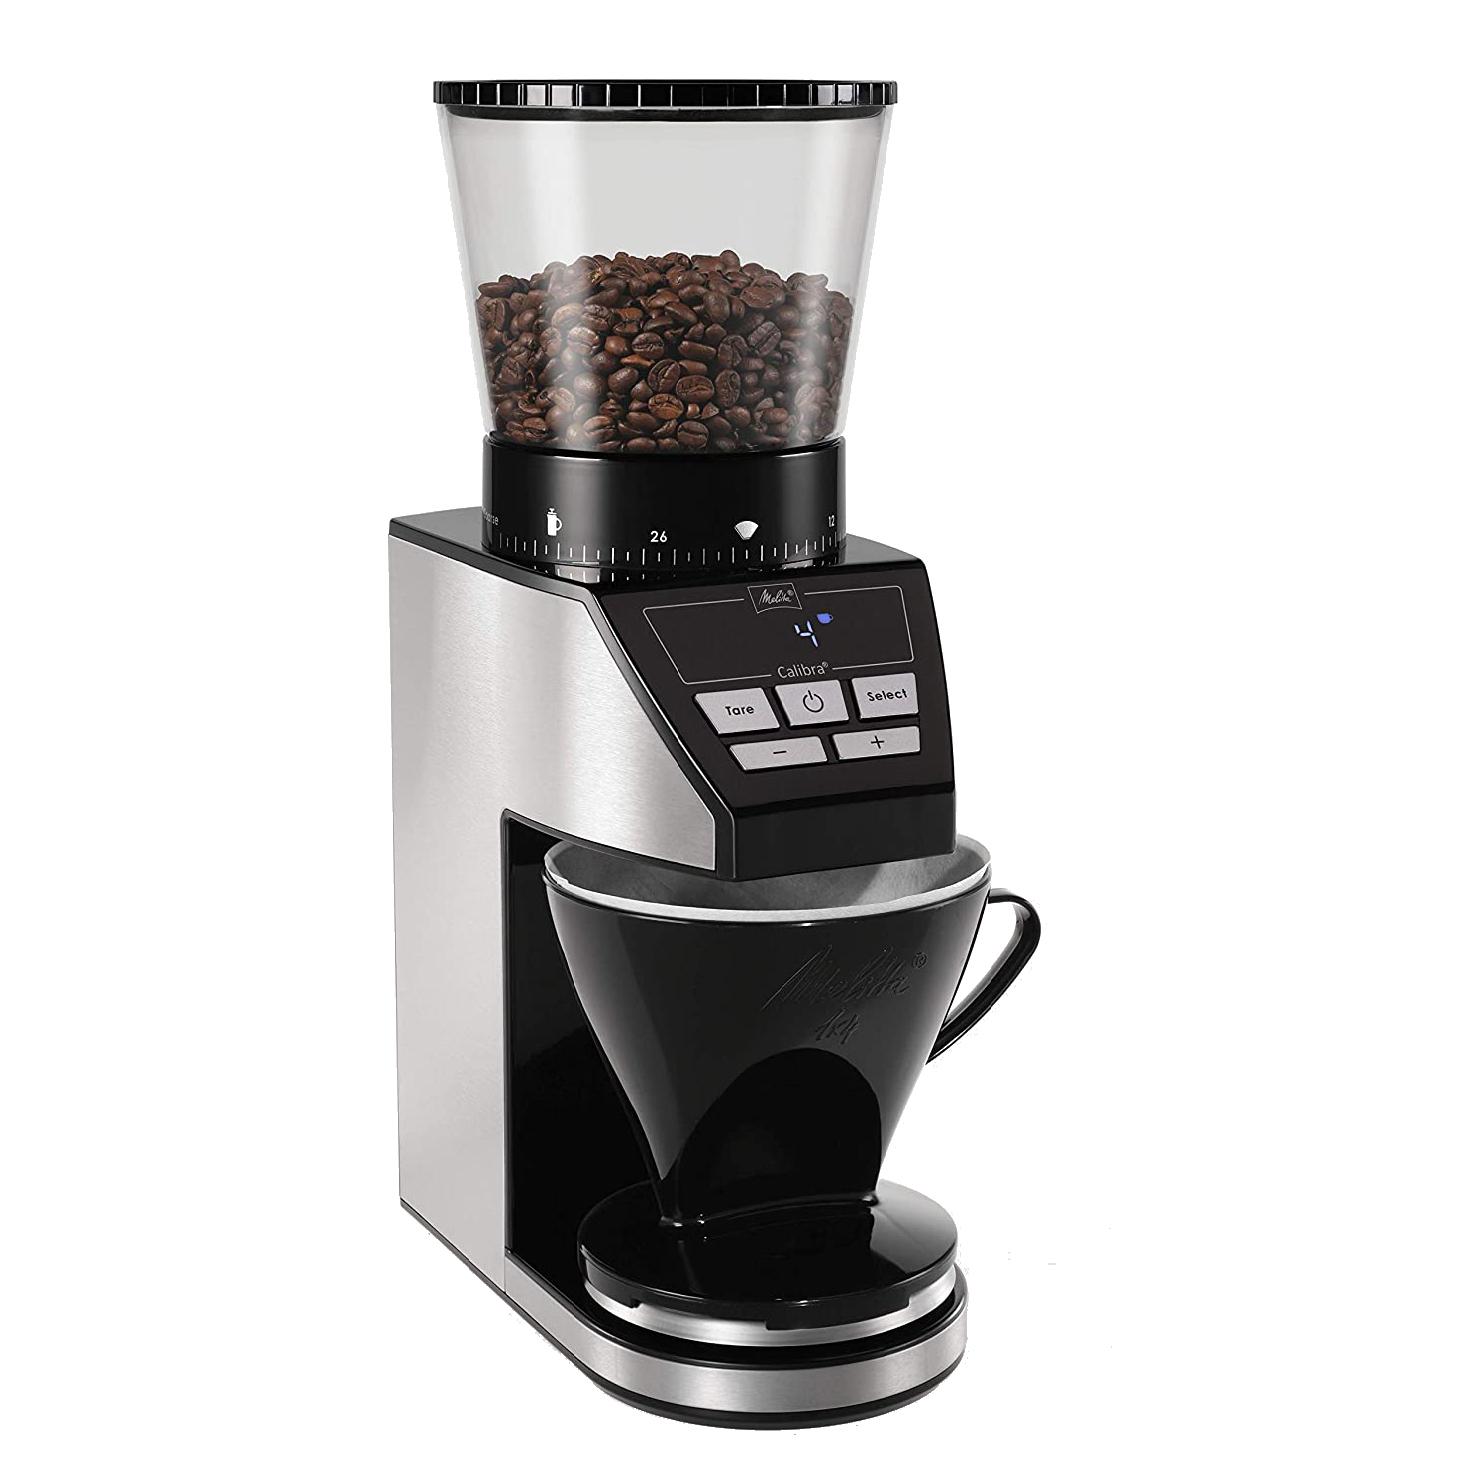 آسیاب قهوه ملیتا مدل کالیبرا